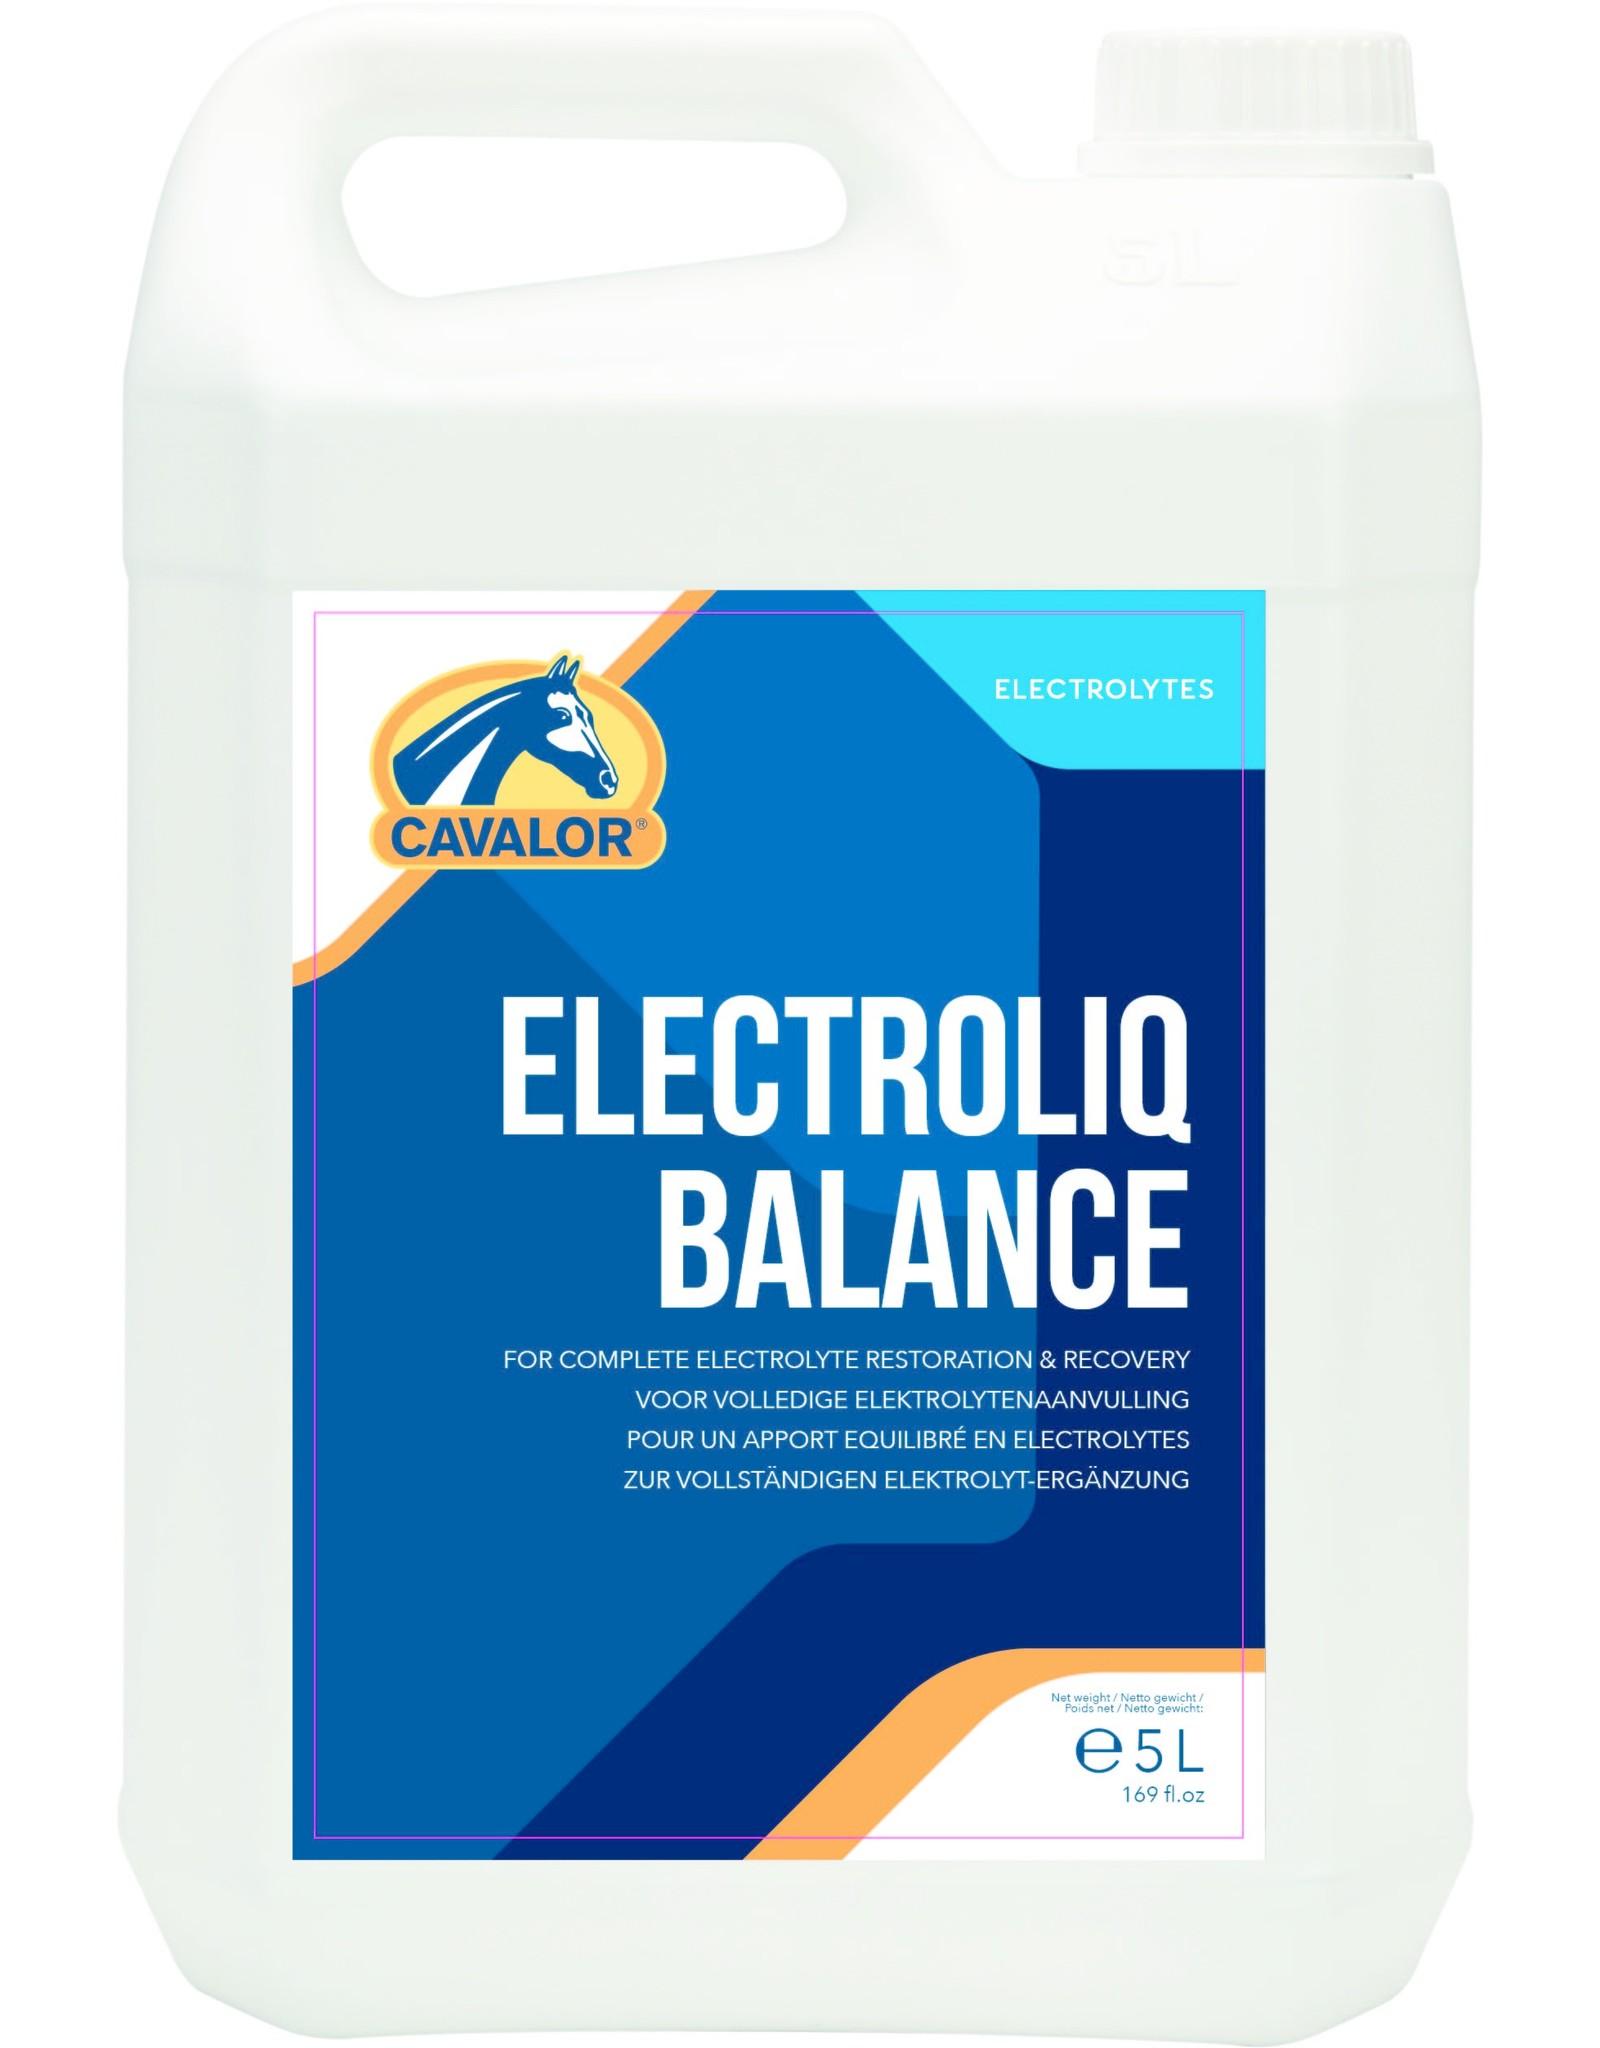 Cavalor Cavalor Electroliq Balance